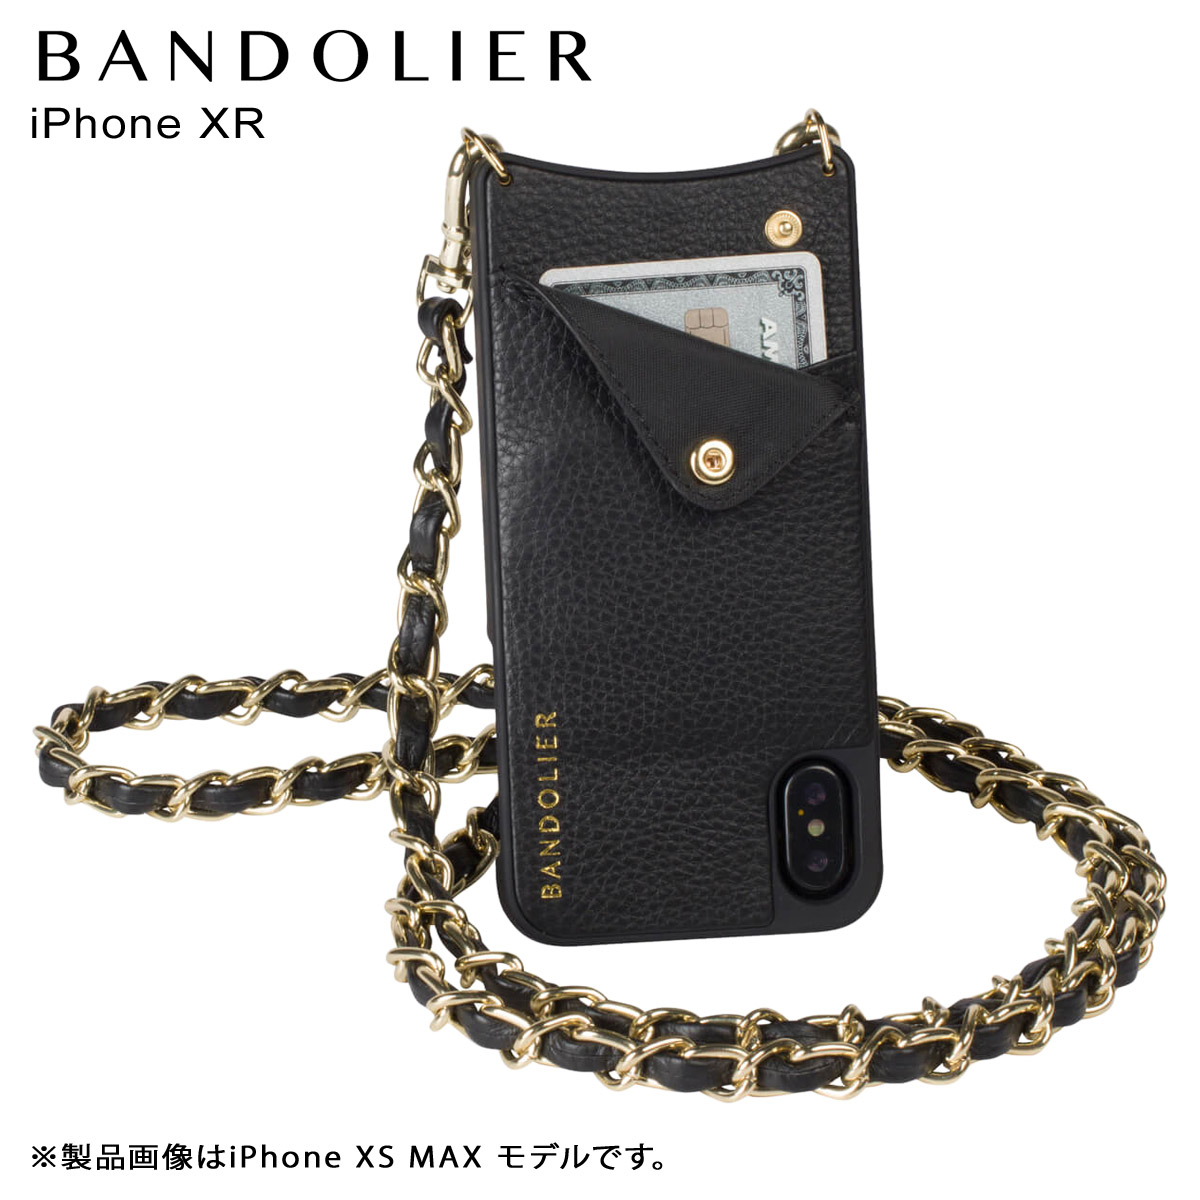 BANDOLIER バンドリヤー iPhone XR ケース スマホ 携帯 ショルダー アイフォン レザー LUCY GOLD メンズ レディース ブラック 10LCY1001